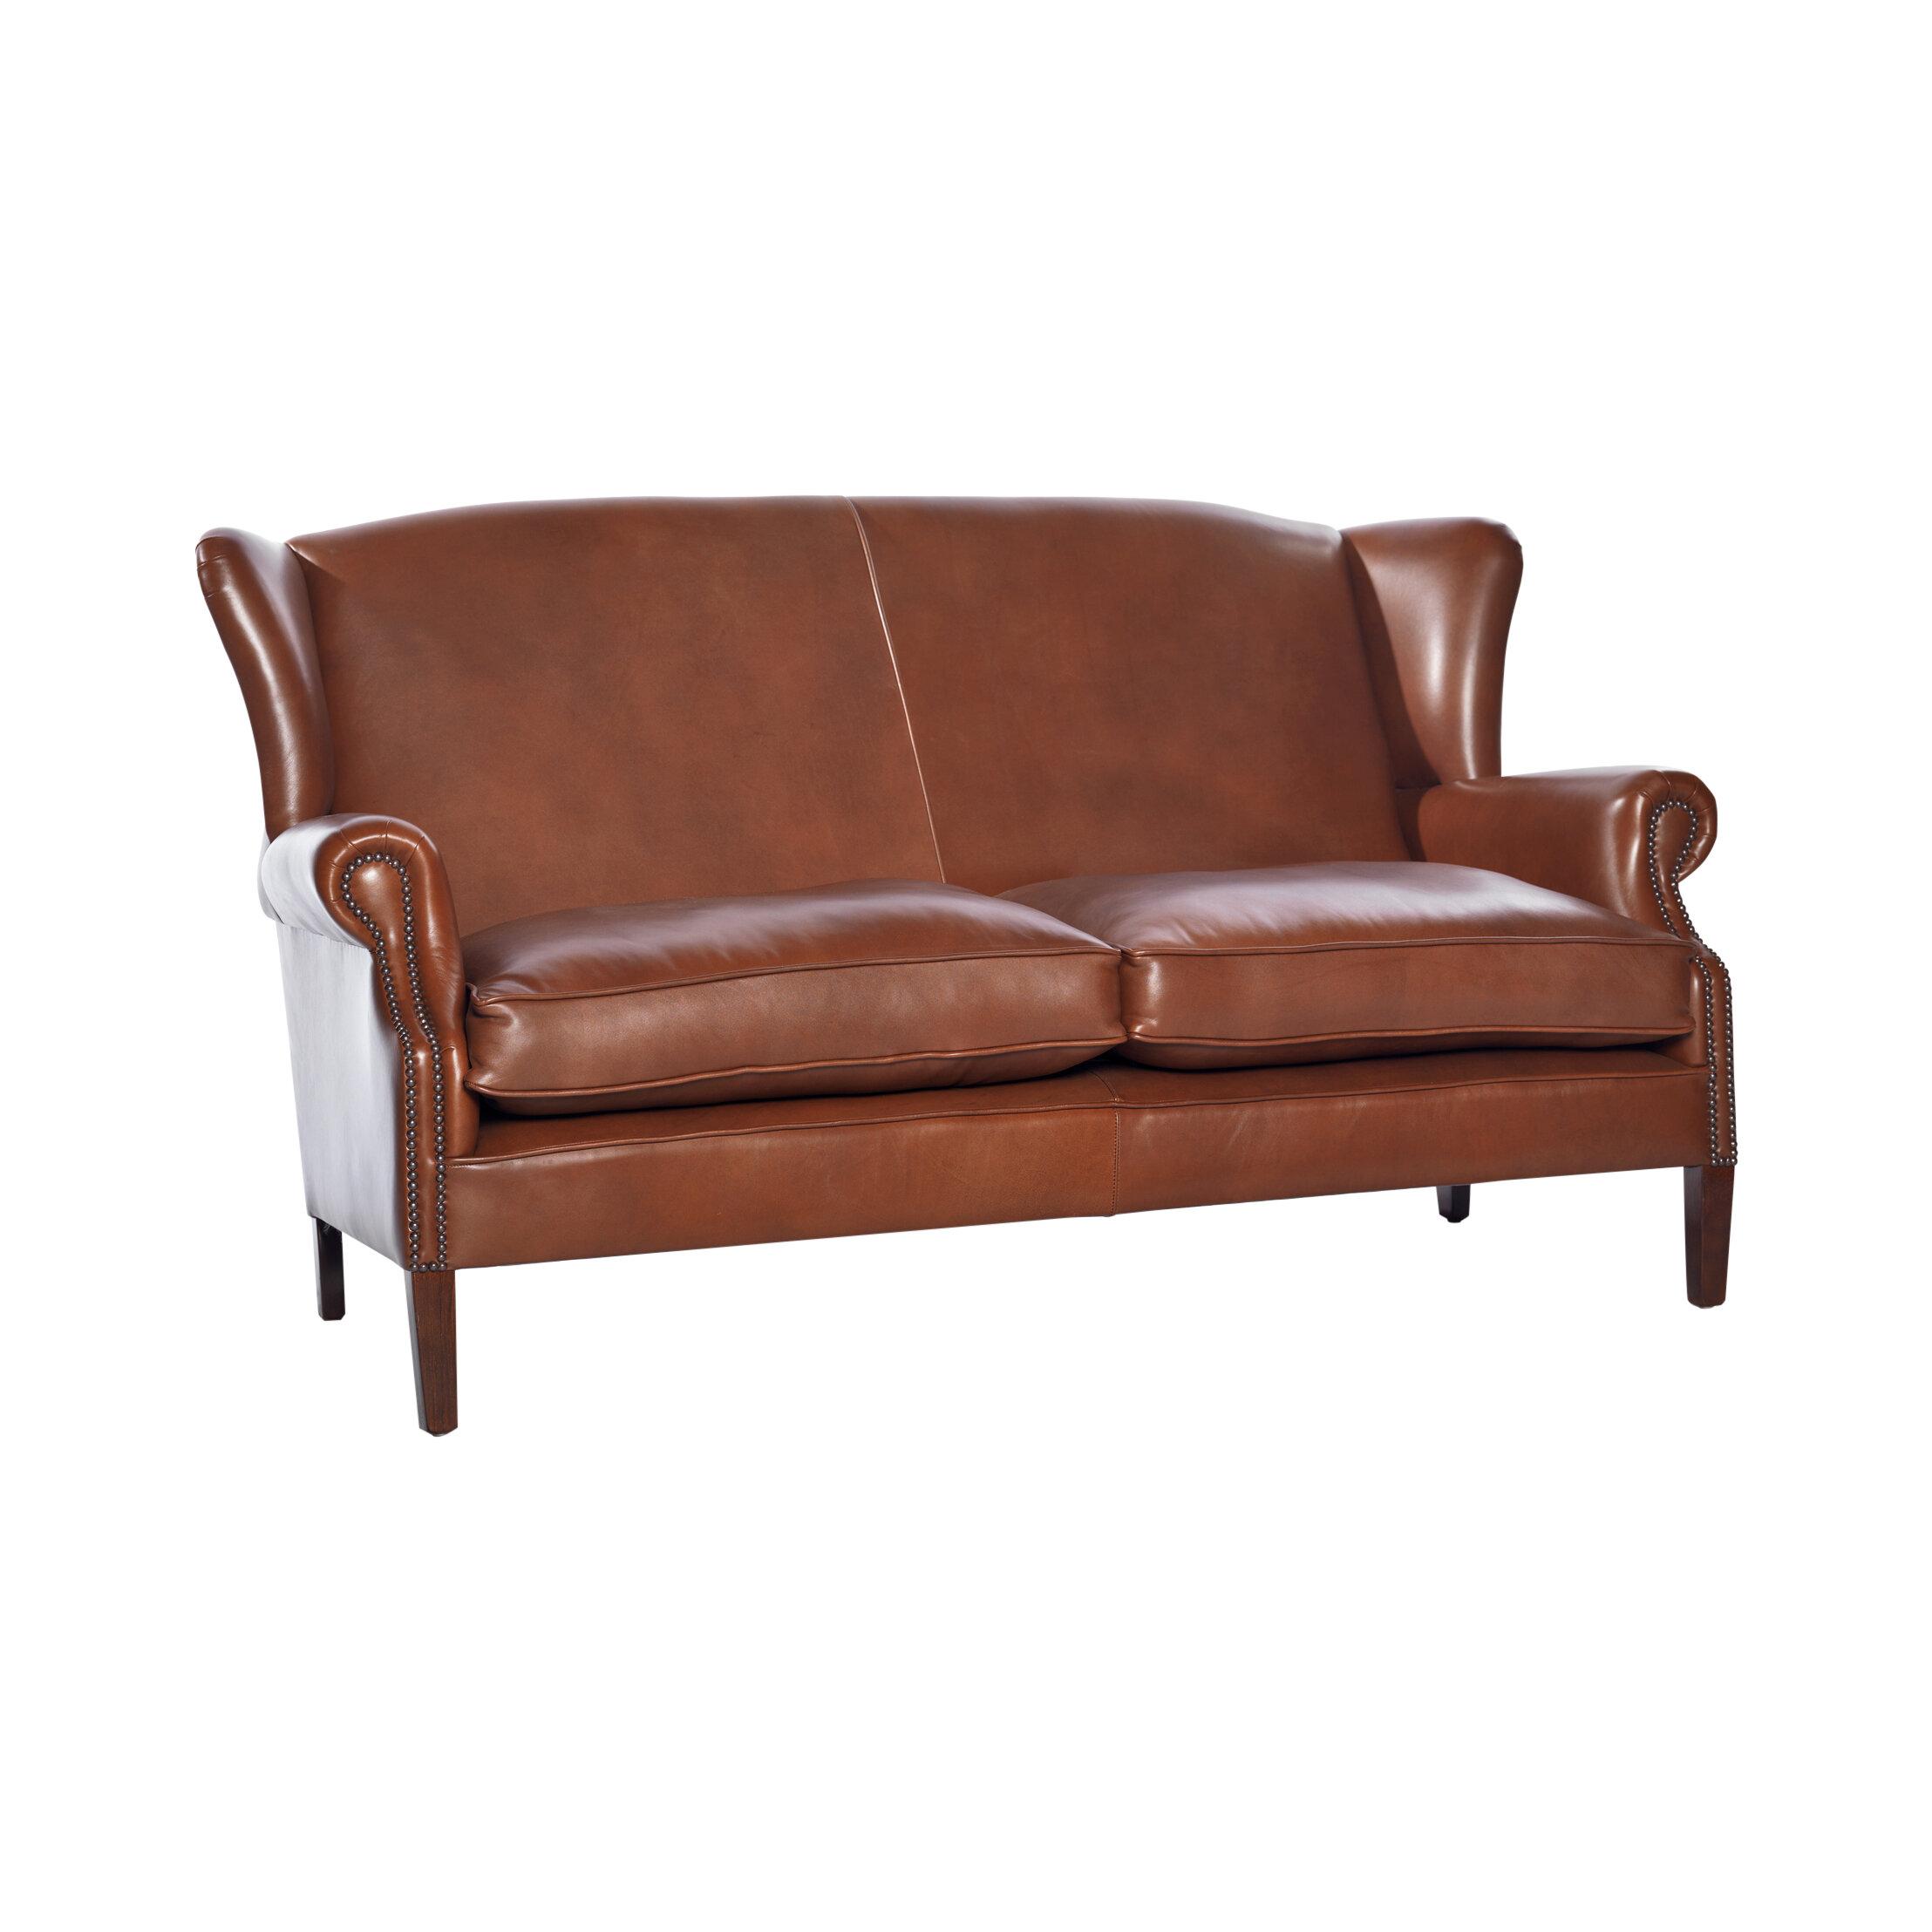 UK Icon Design Victorian Leather 3 Seater Sofa | Wayfair.co.uk